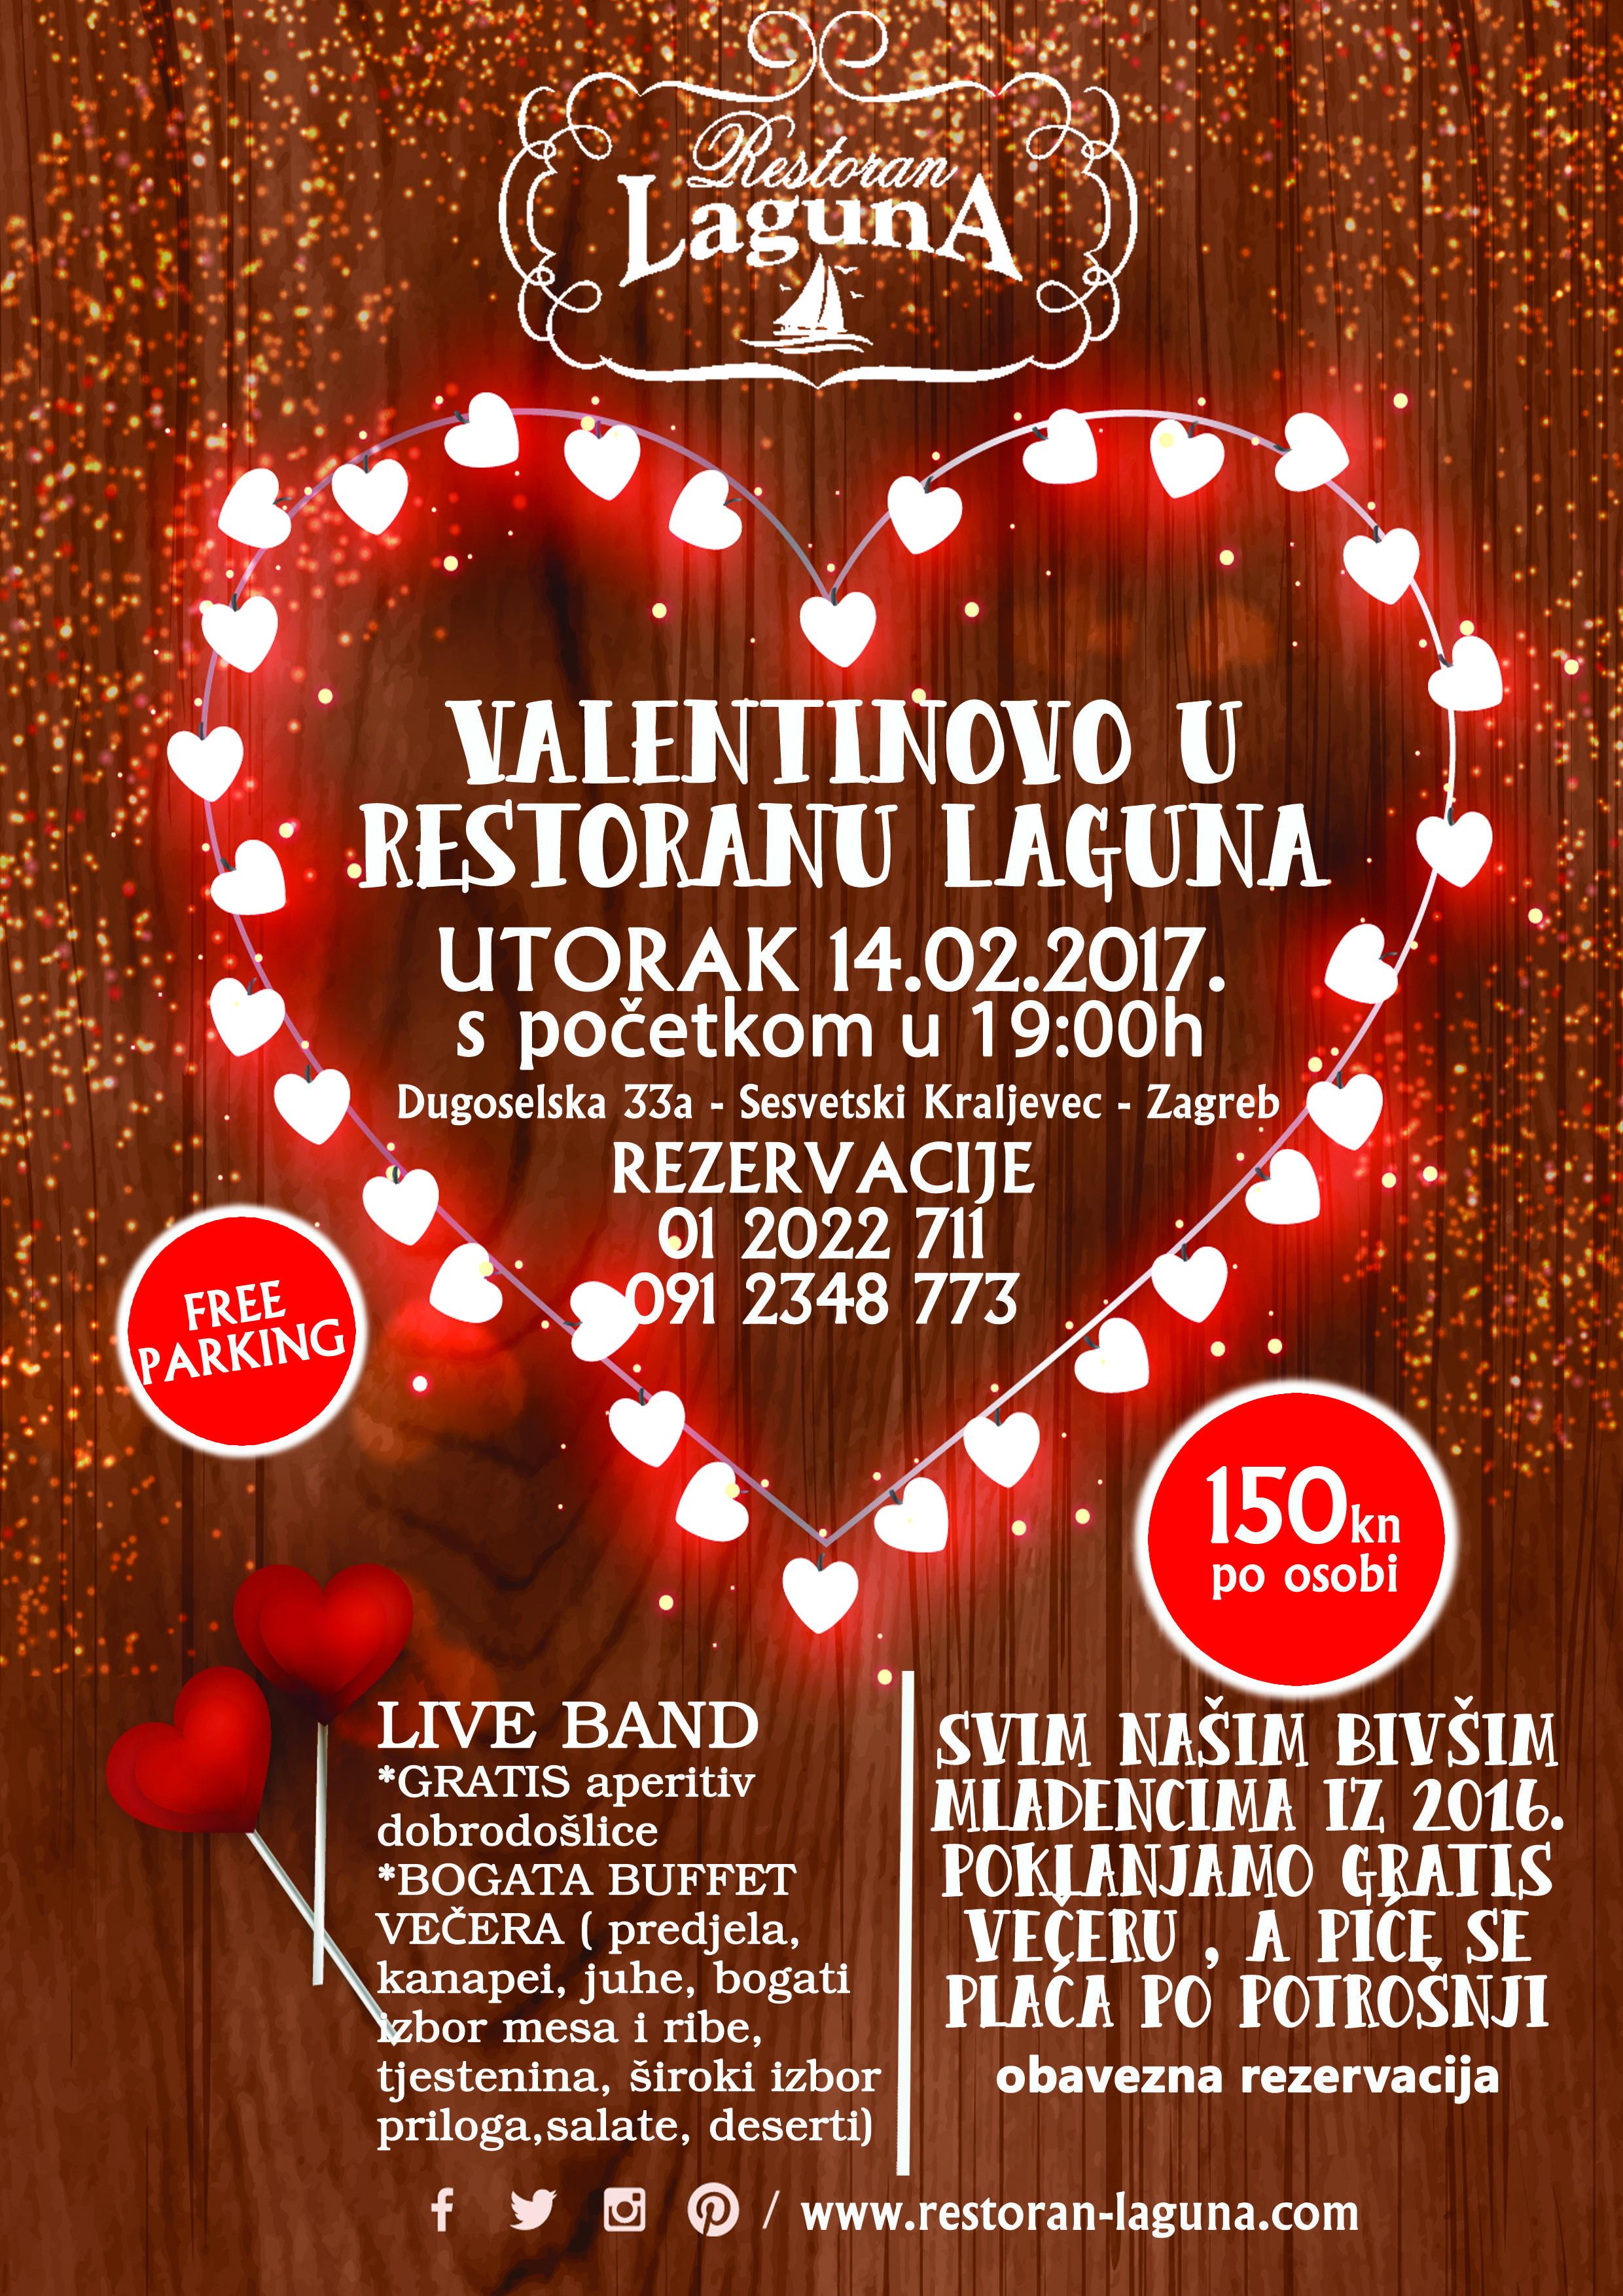 Pin By Centar Elez On Valentinovo U Restoranu Laguna 2017 Movie Posters Movies Poster